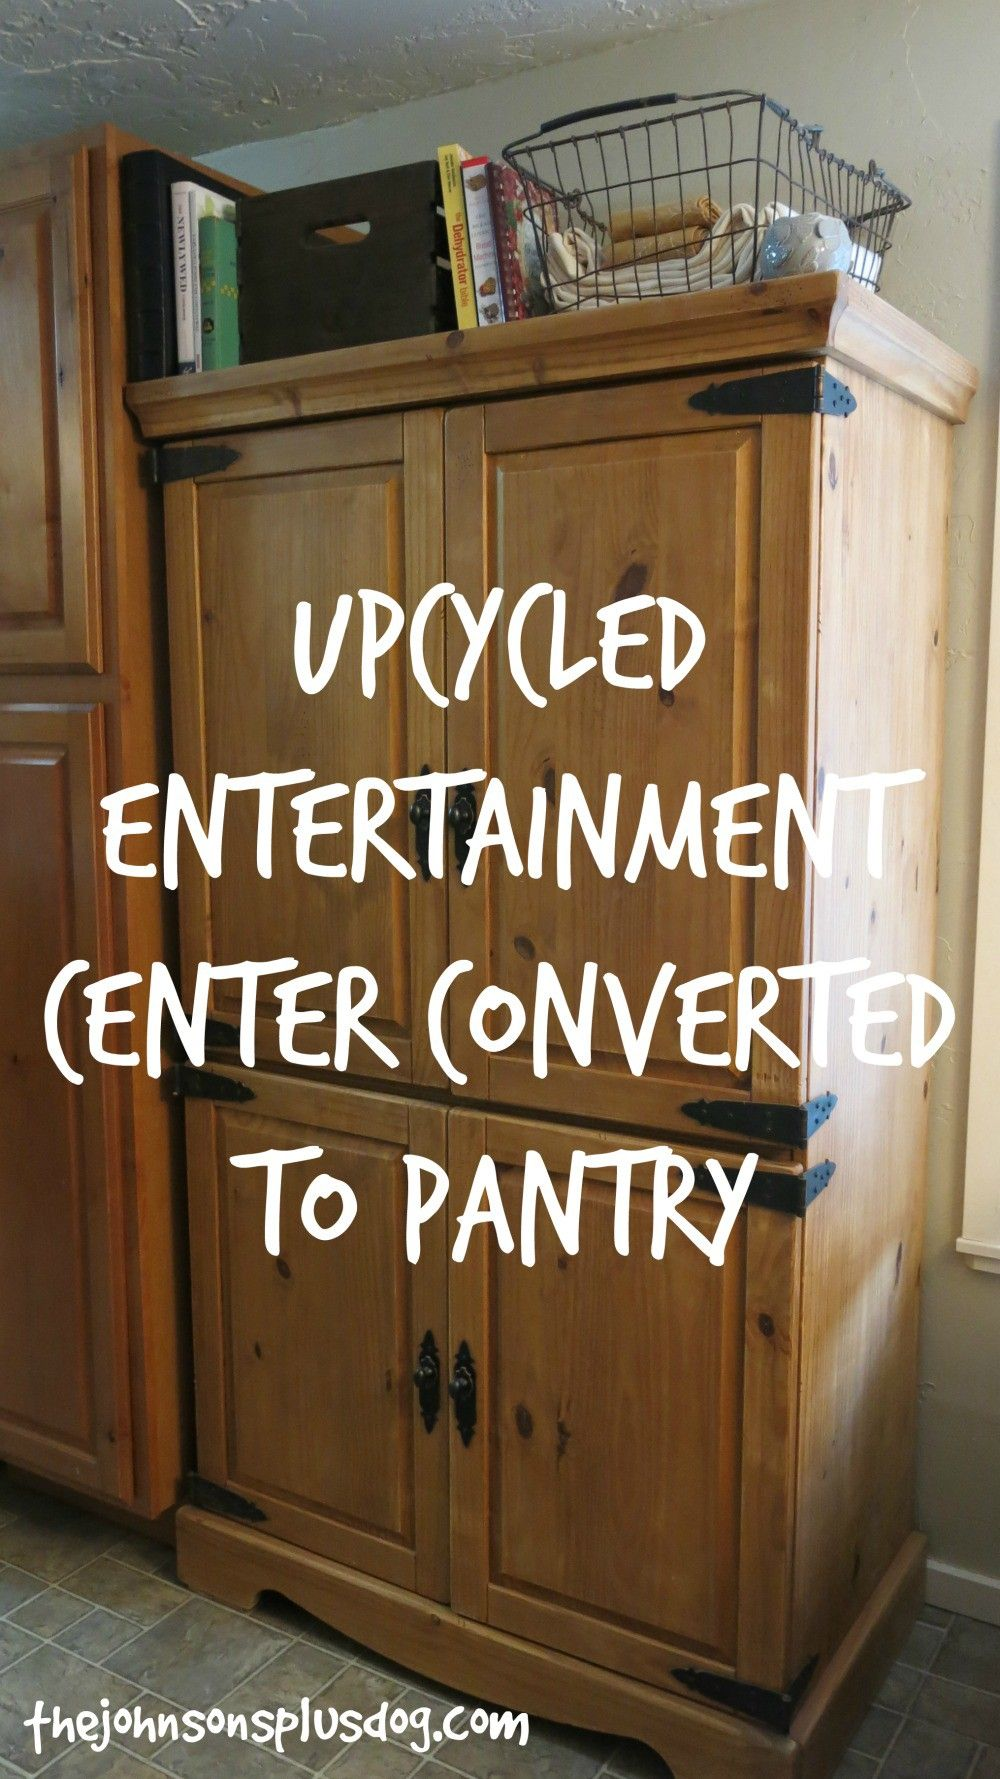 Upcycled Entertainment Center | Orginization Ideas | Pinterest